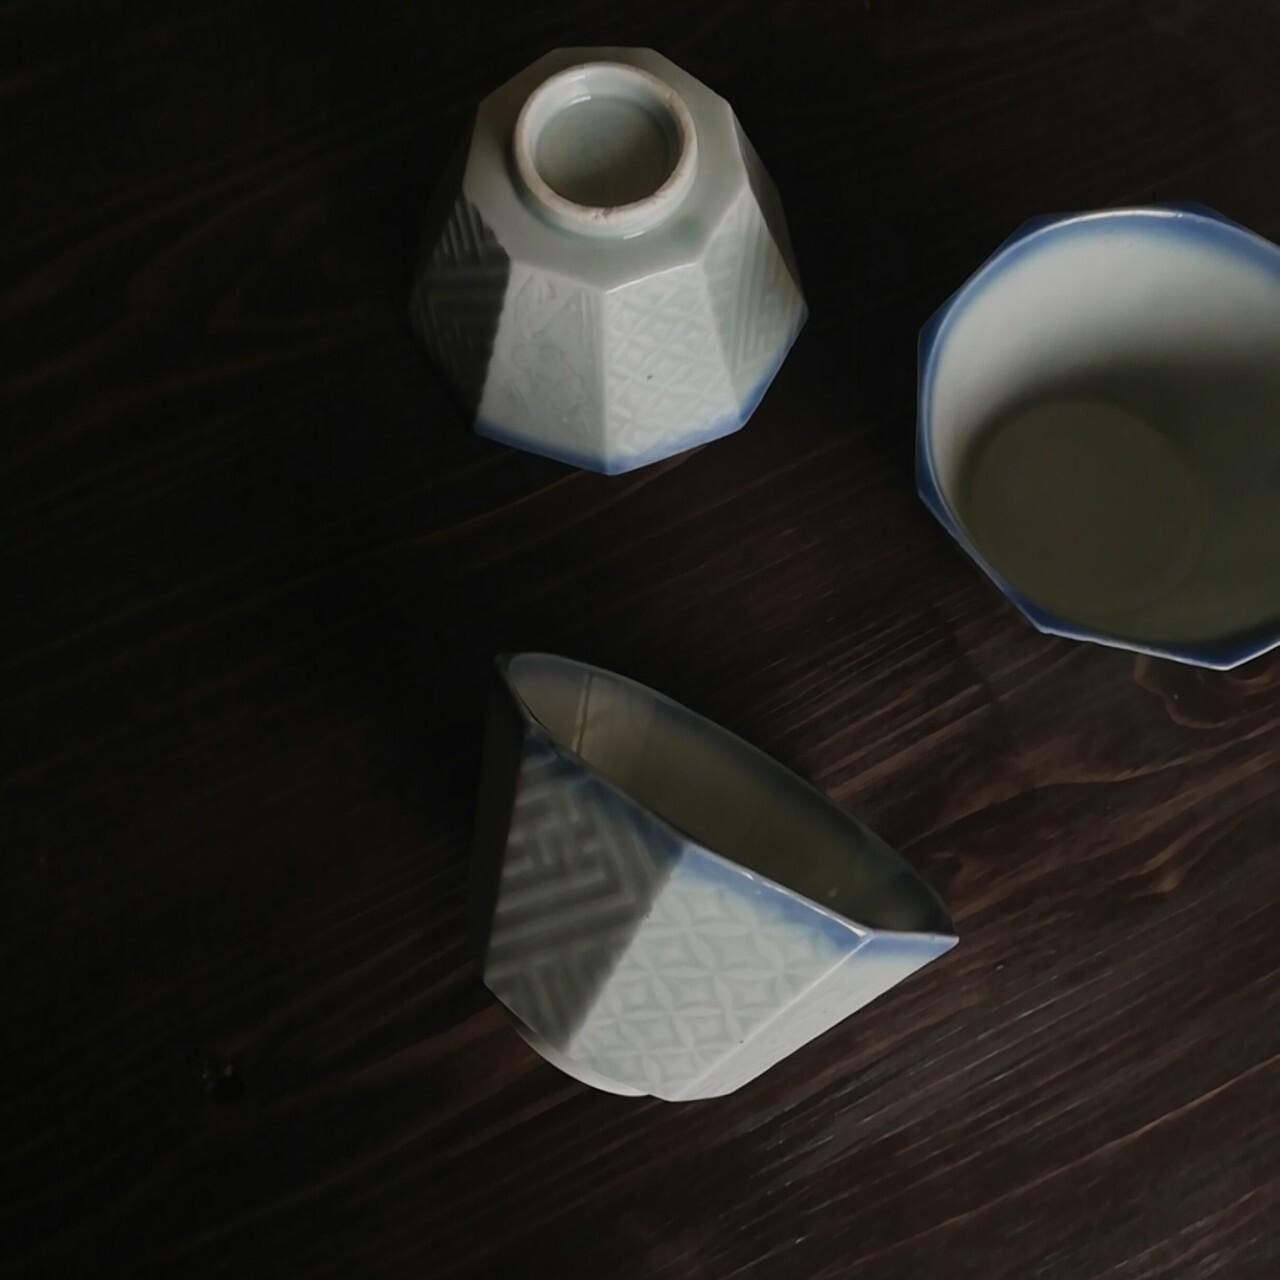 統制陶器「品39」松竹梅 青磁小鉢 3客セット【戦時中】